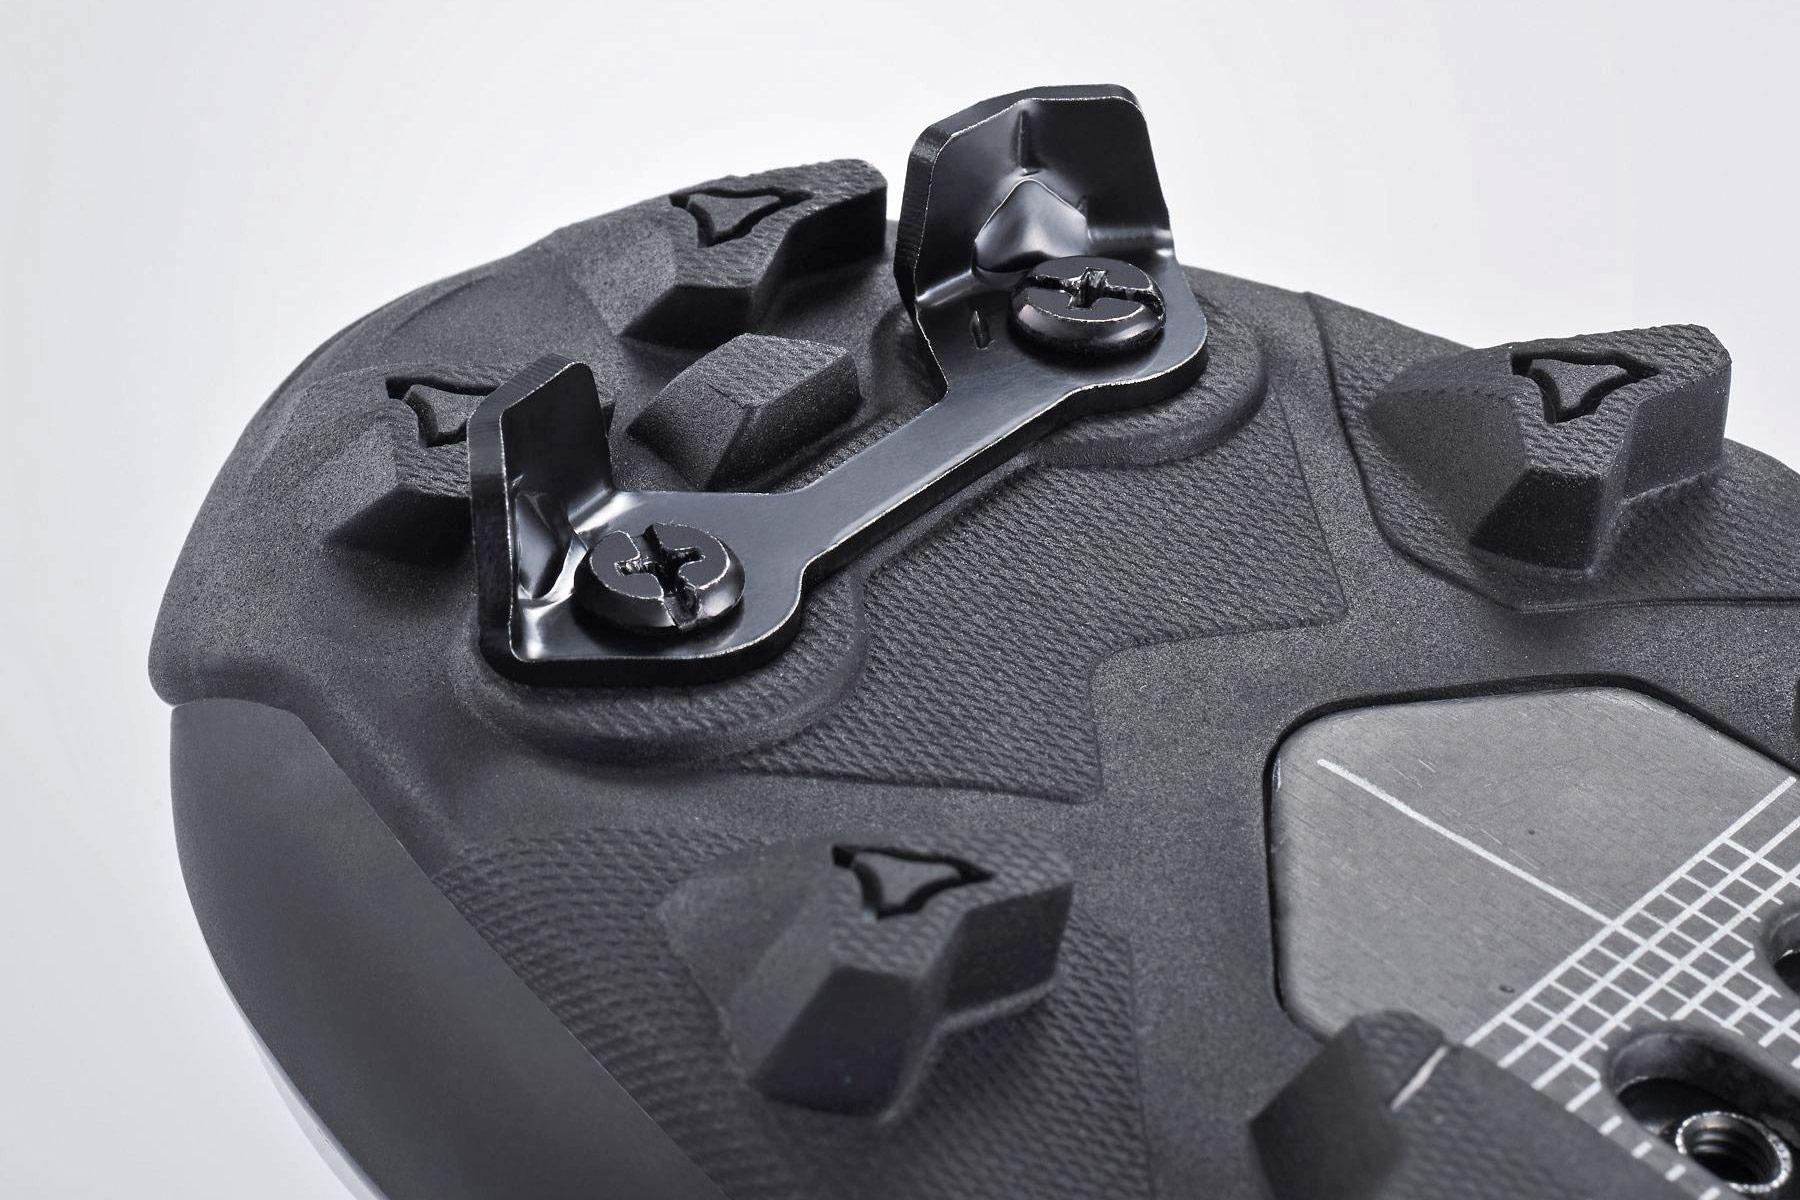 Shimano S-Phyre XC902 MTB shoes, next-gen XC9 cross-country mountain bike shoe,talon crampon toe-spikes